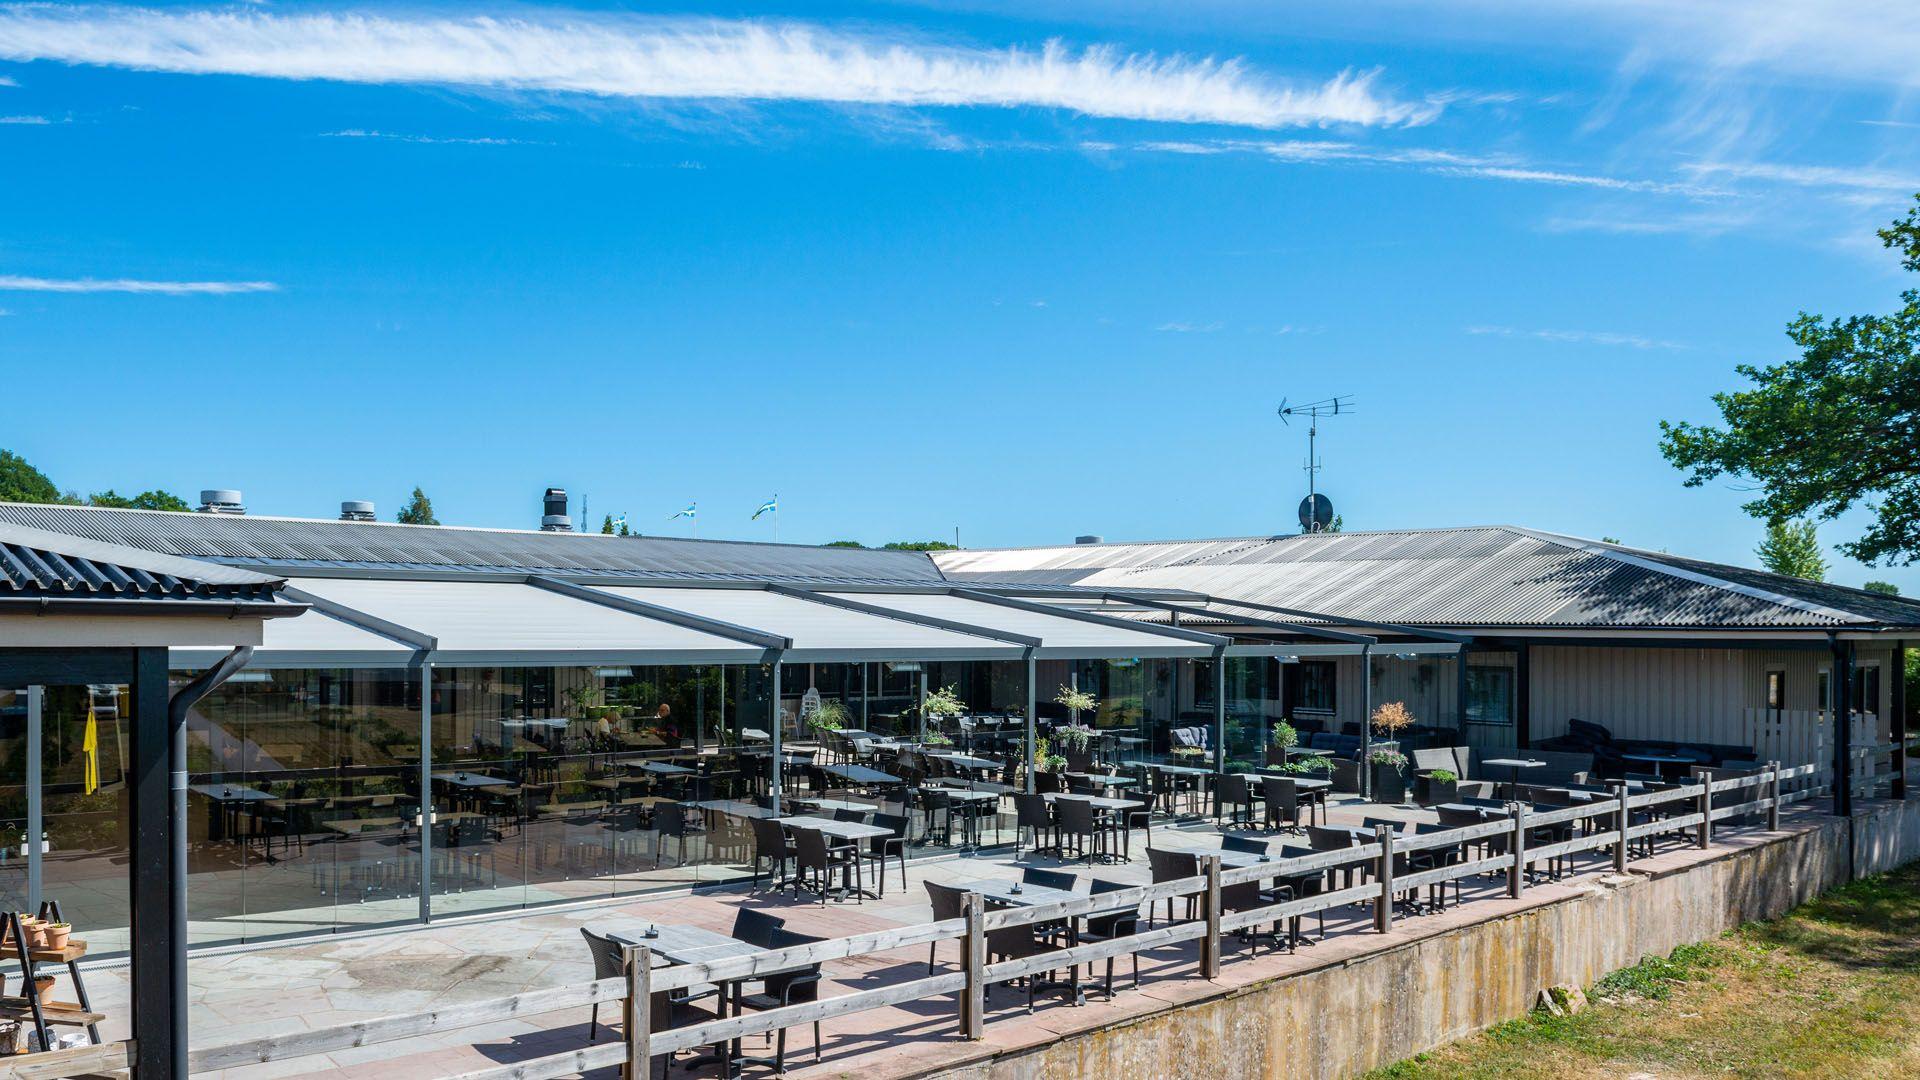 Borgholm lundegard 10